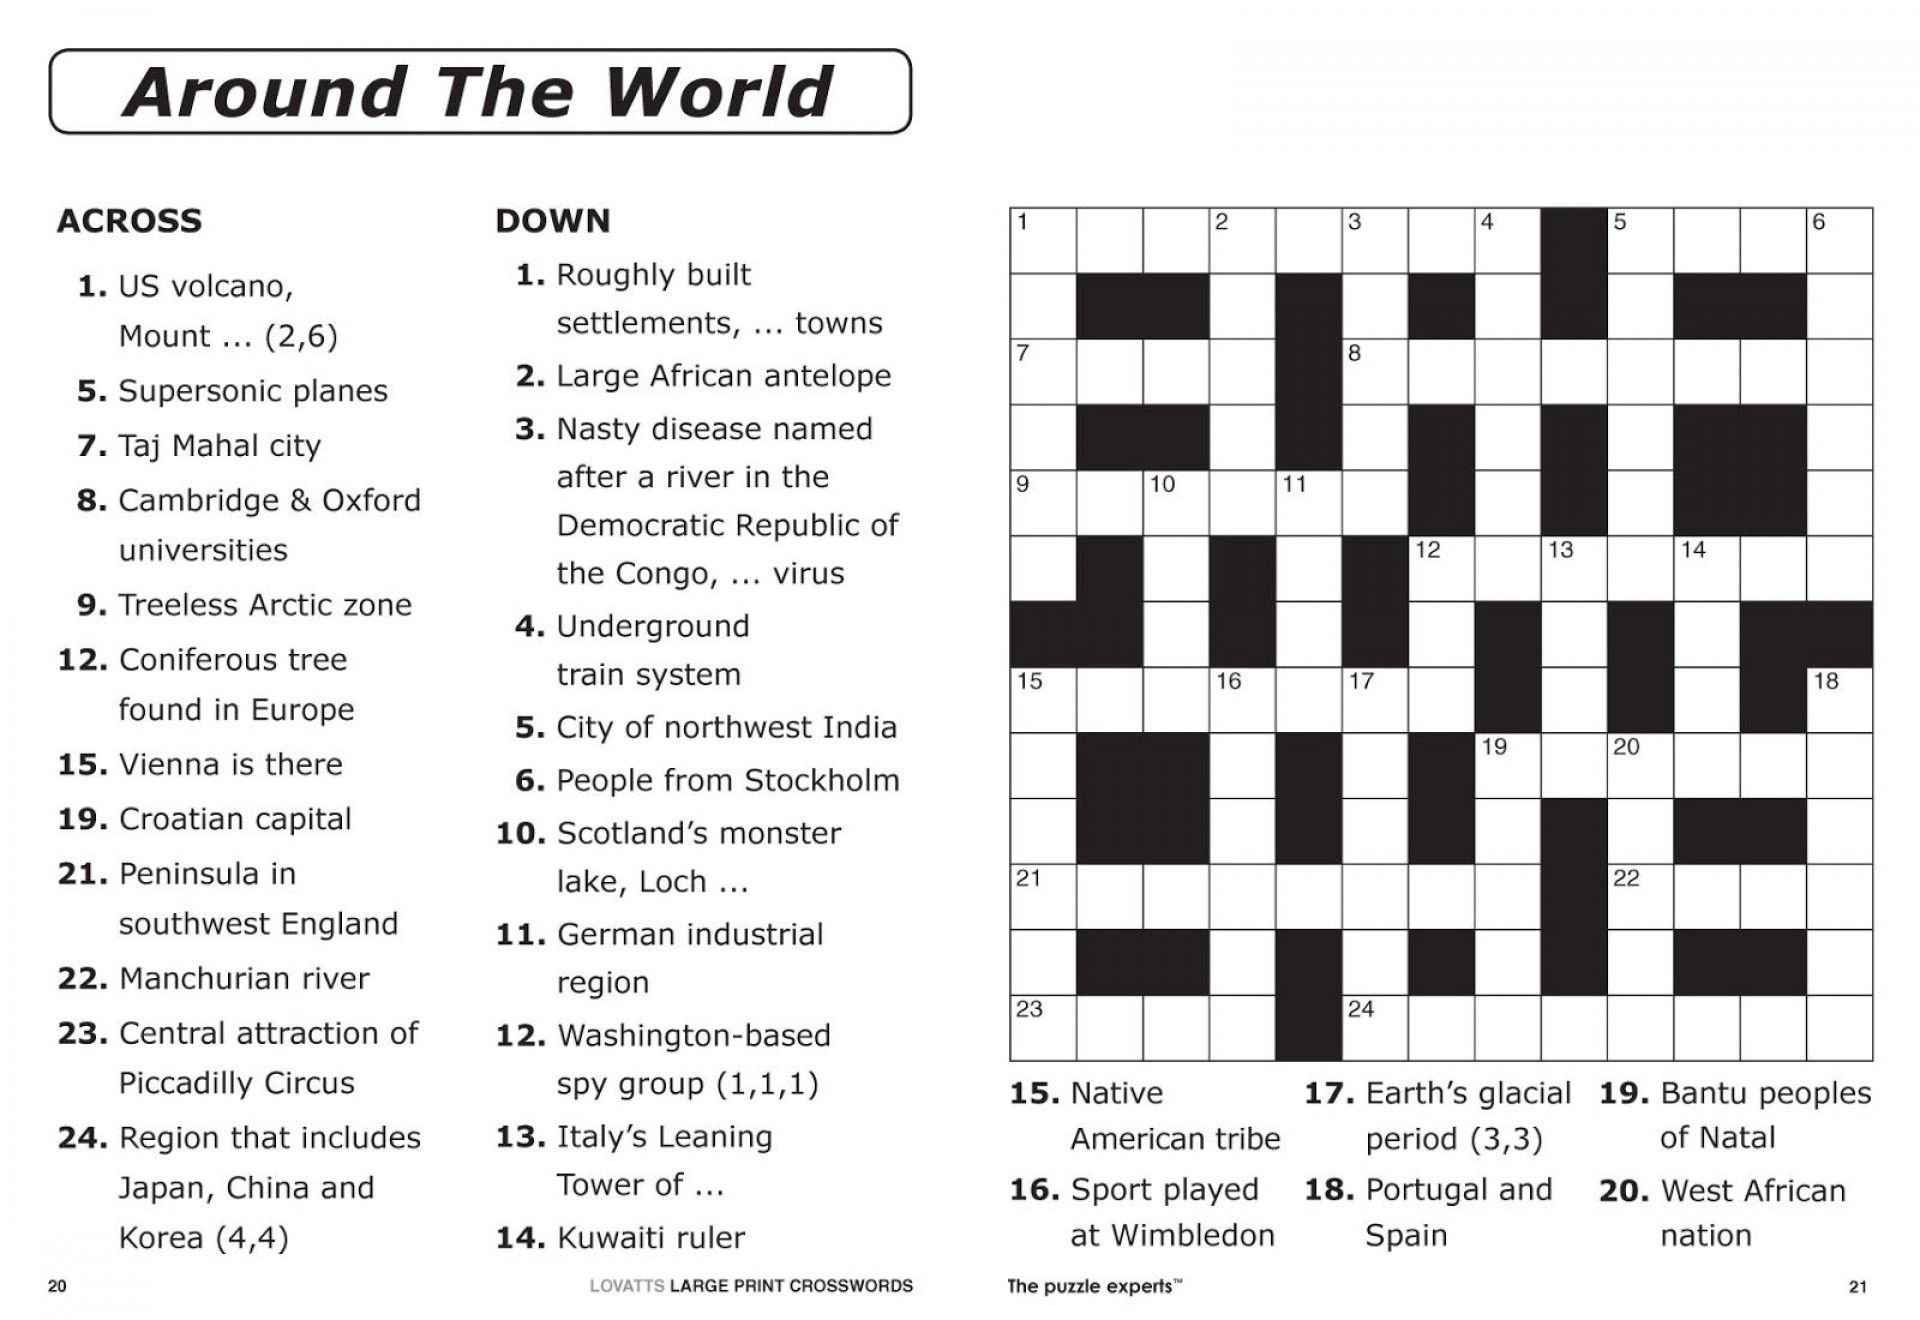 Printable Crossword Puzzles Get Yourself Some Easy Crossword Puzzles Printa Printable Crossword Puzzles Free Printable Crossword Puzzles Crossword Puzzles [ 1320 x 1920 Pixel ]